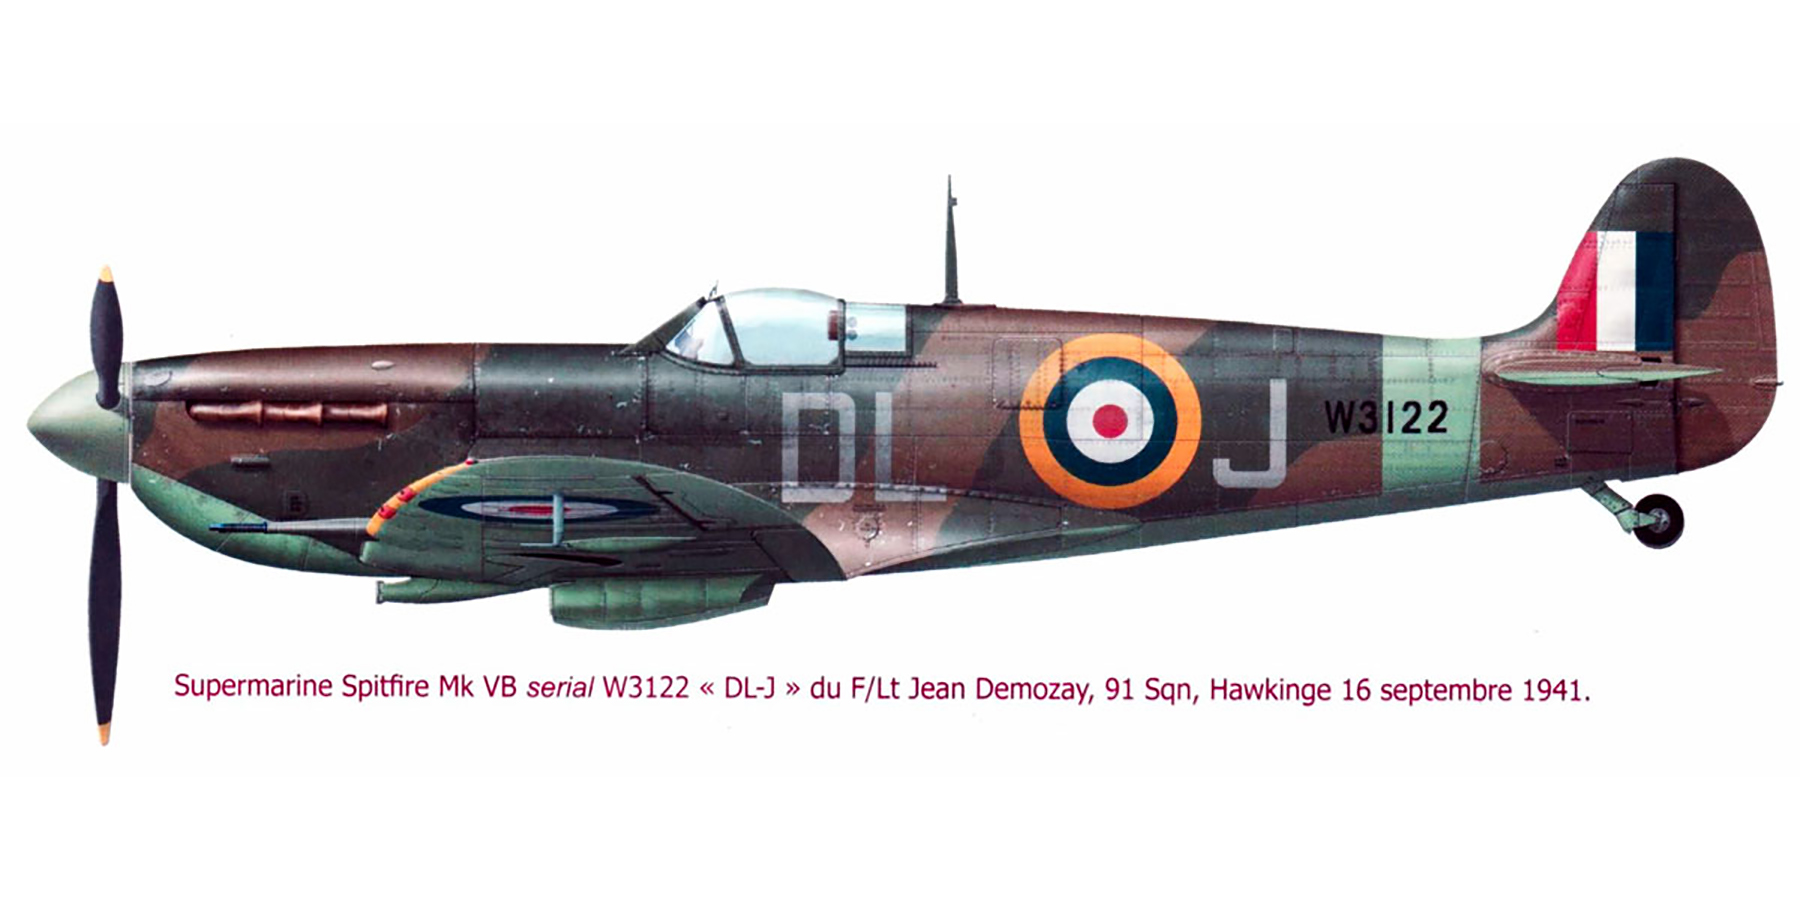 Spitfire MkVb RAF 91Sqn DLJ Jean Demozay W3122 Hawkinge 16th Sep 1941 0A